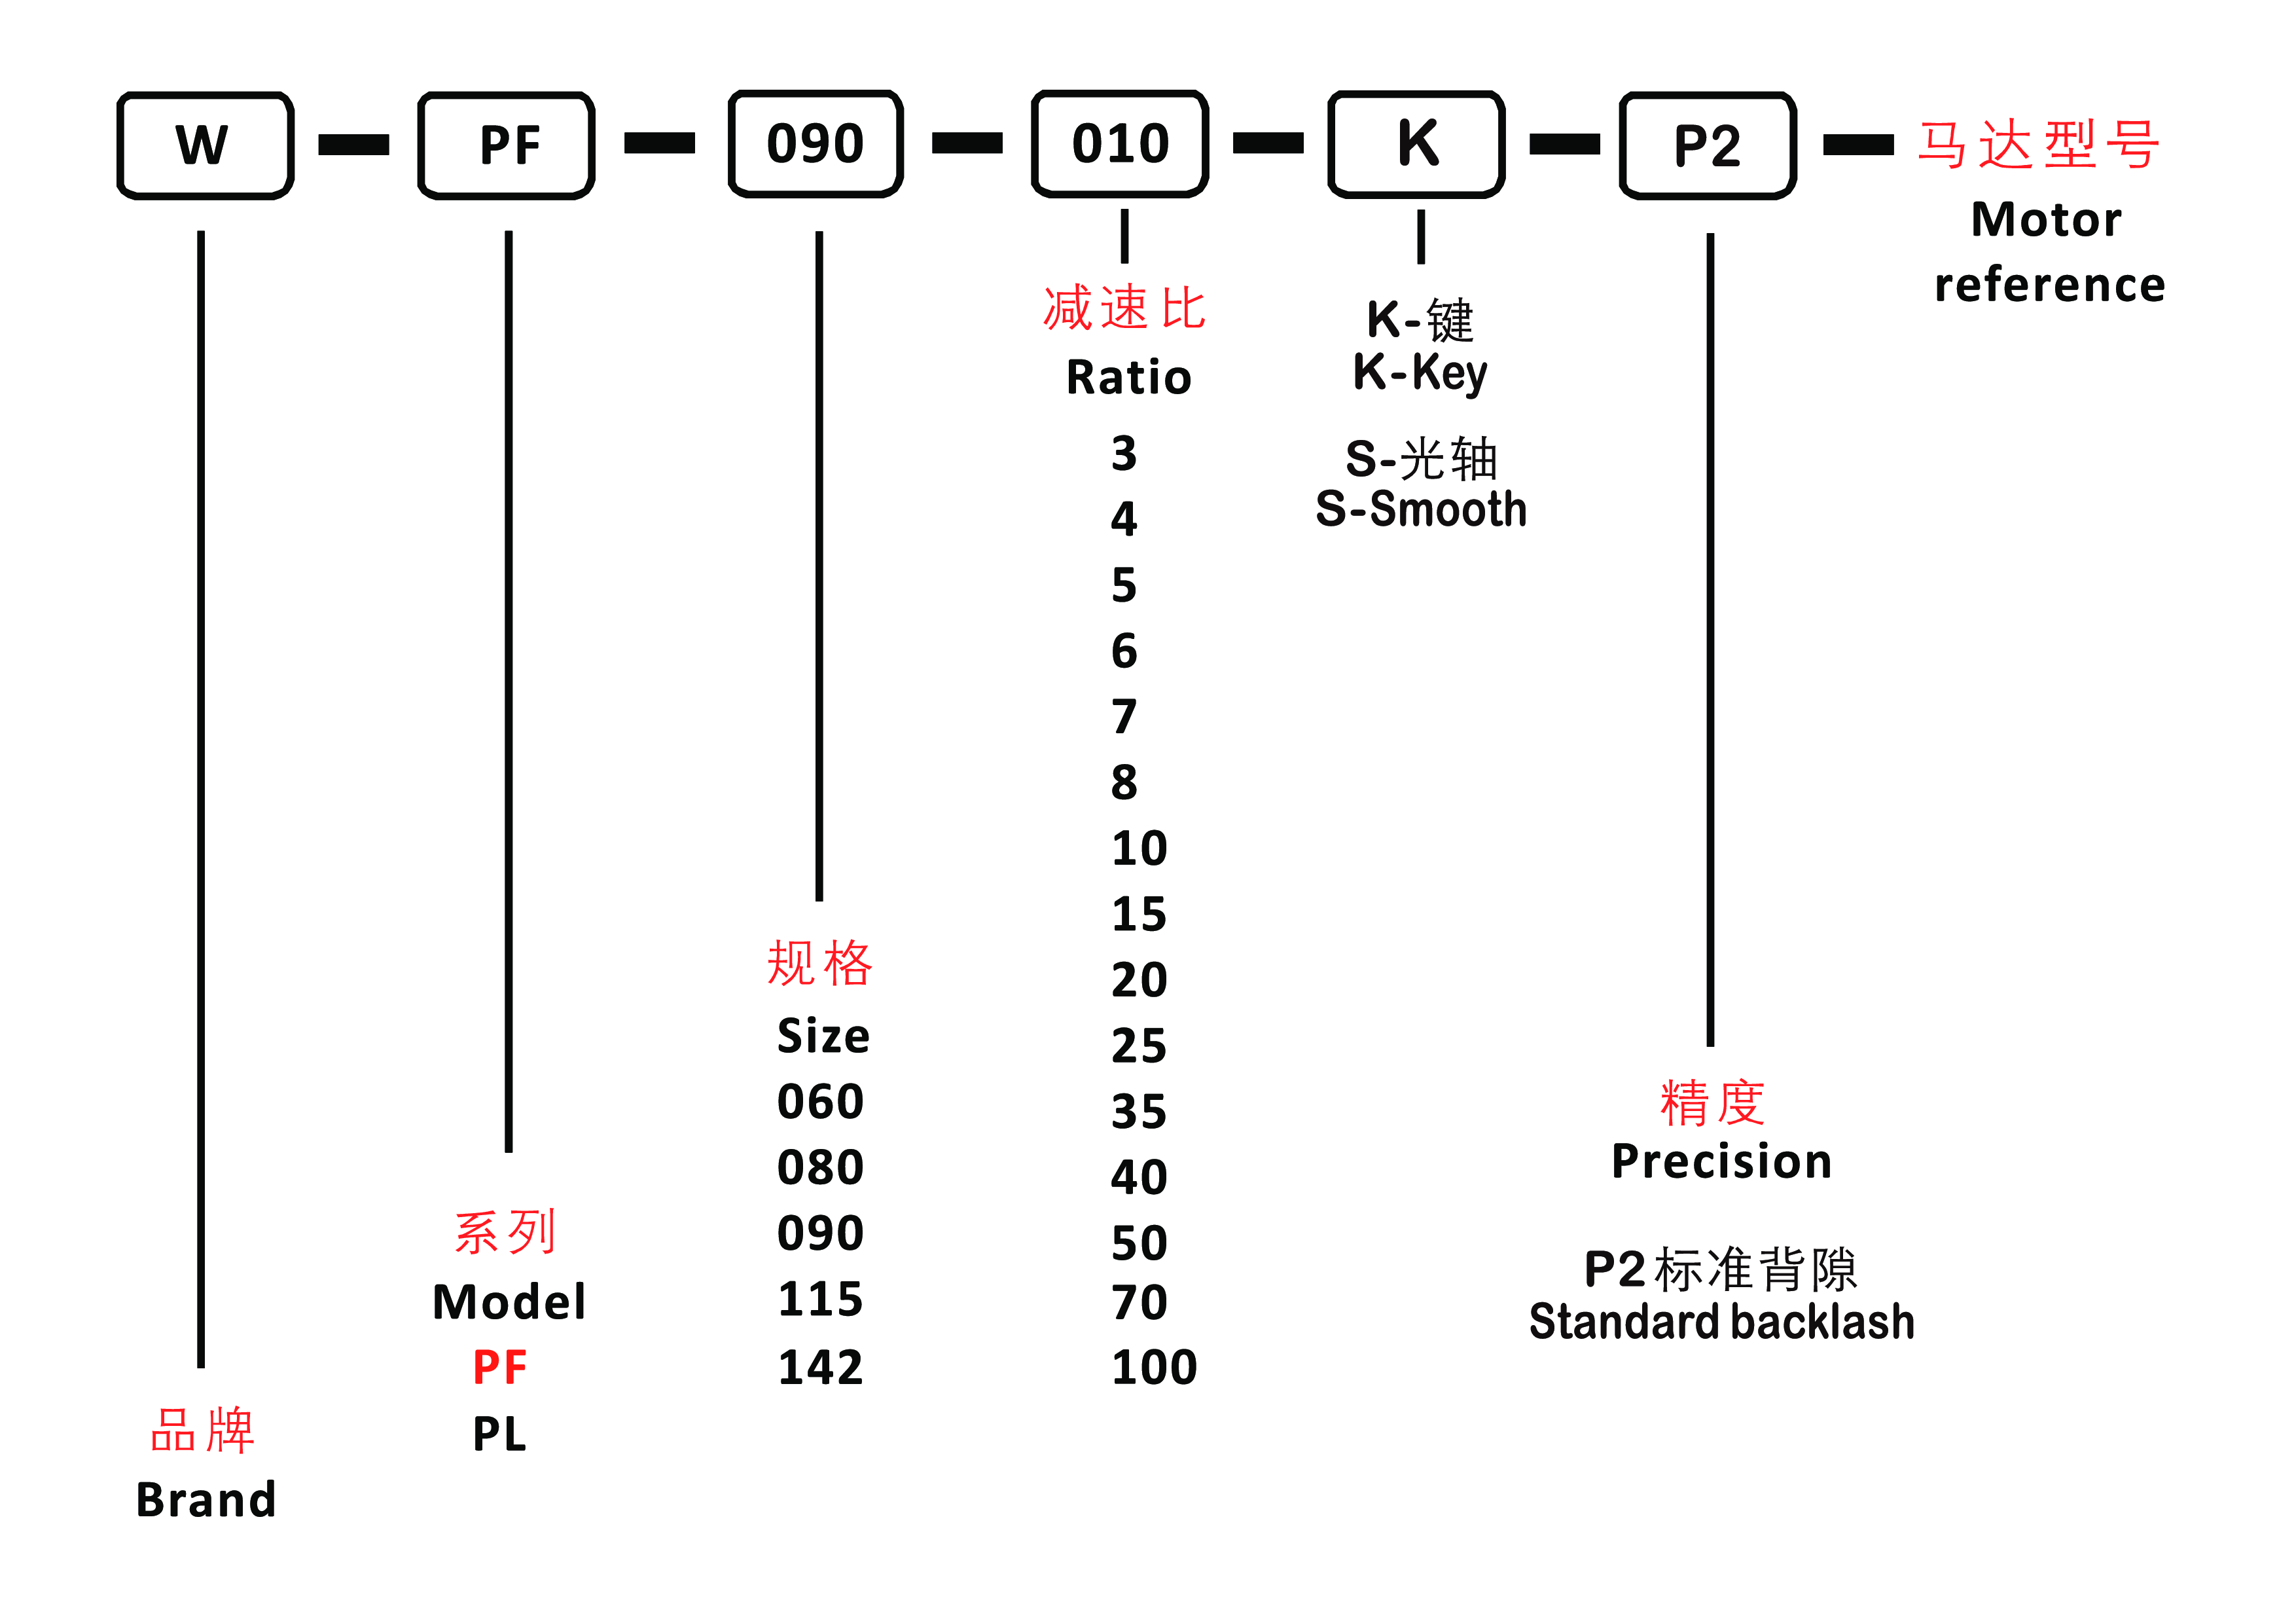 система обозначений PF.